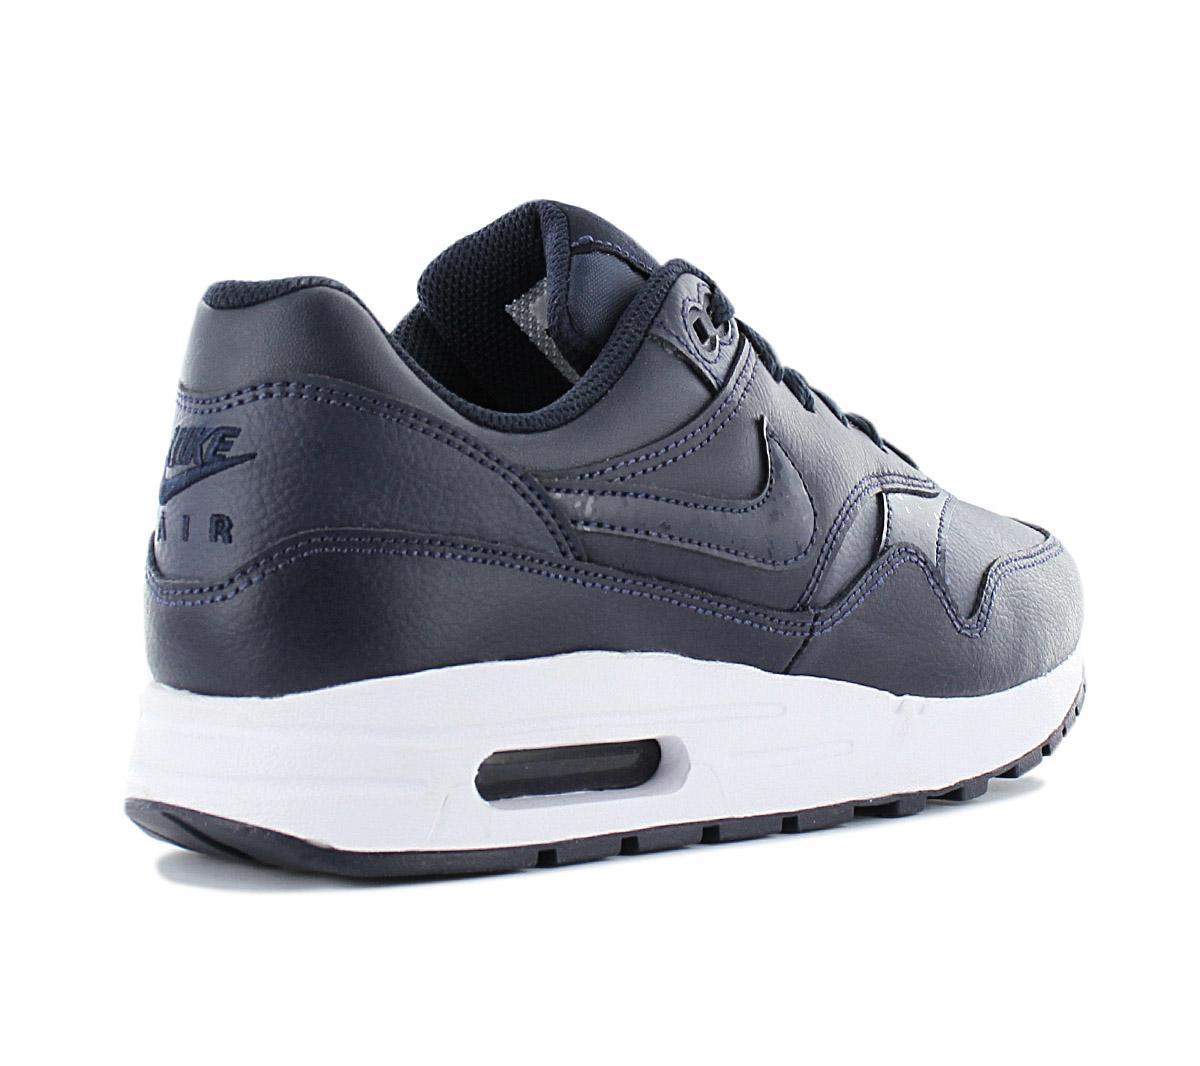 NIKE AIR MAX 1 Leather ID Gr.43 Schuhe Sneaker Herren Leder blau Neu 90 Premium